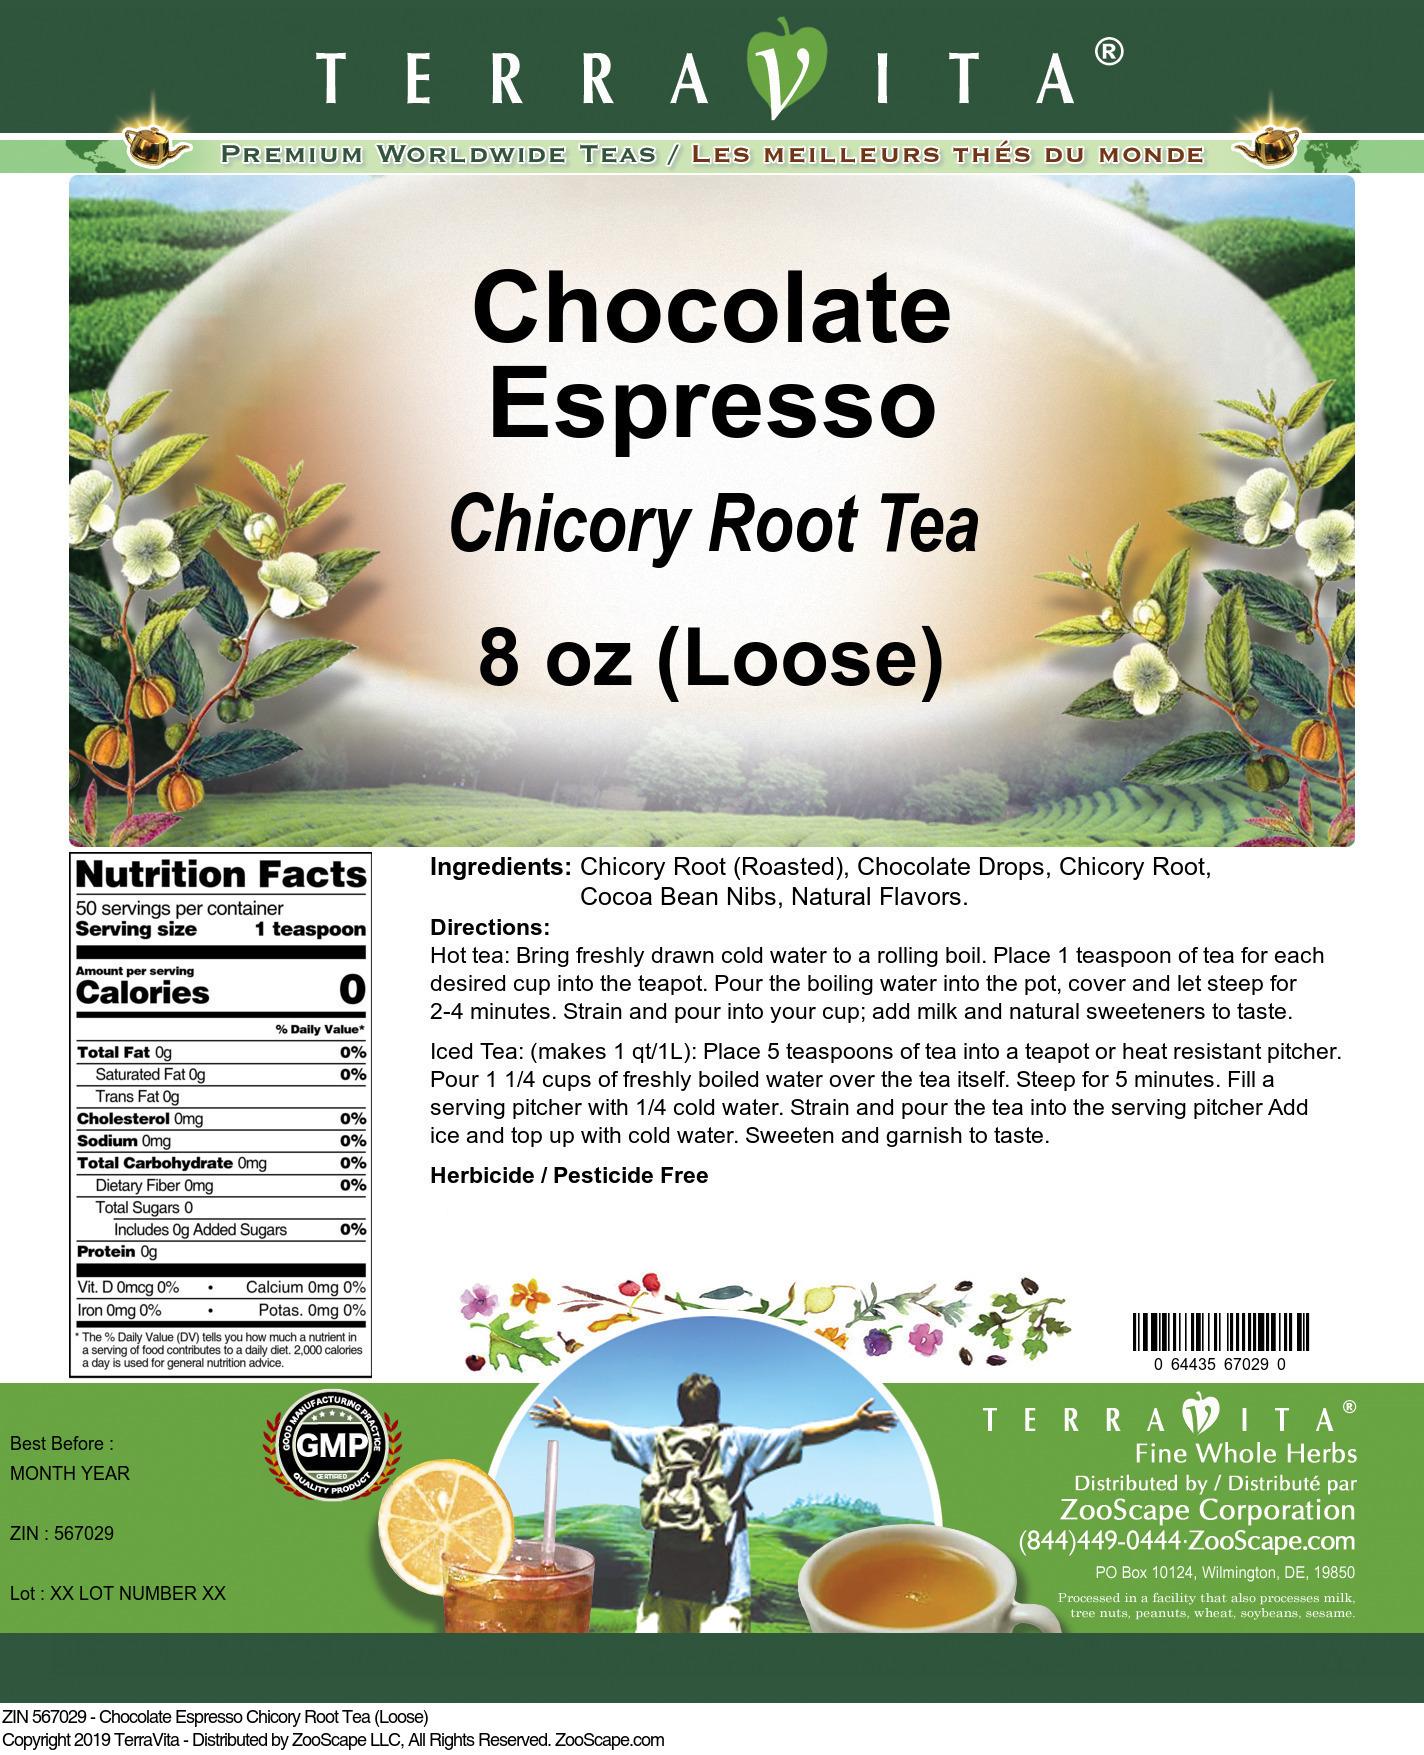 Chocolate Espresso Chicory Root Tea (Loose)